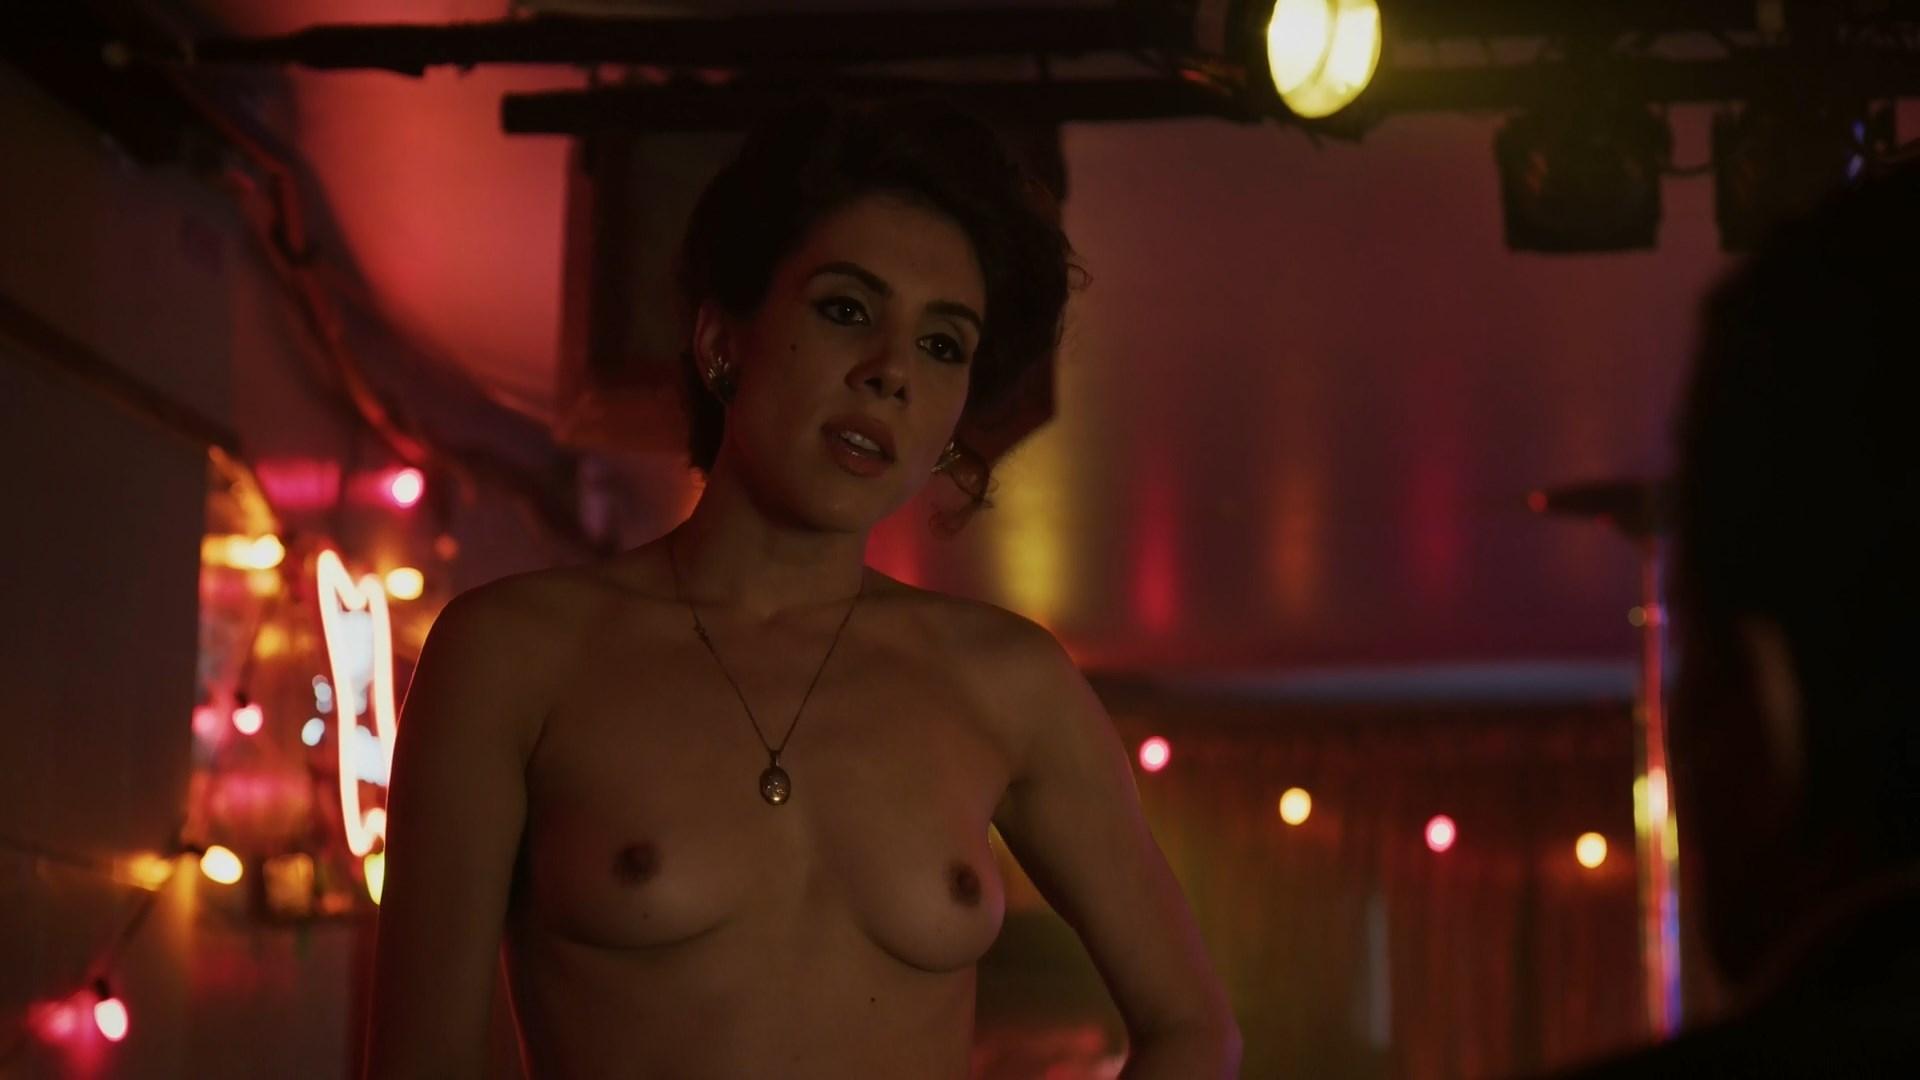 Marie Rose Baramo nude - Godfather of Harlem s01e02 (2019)